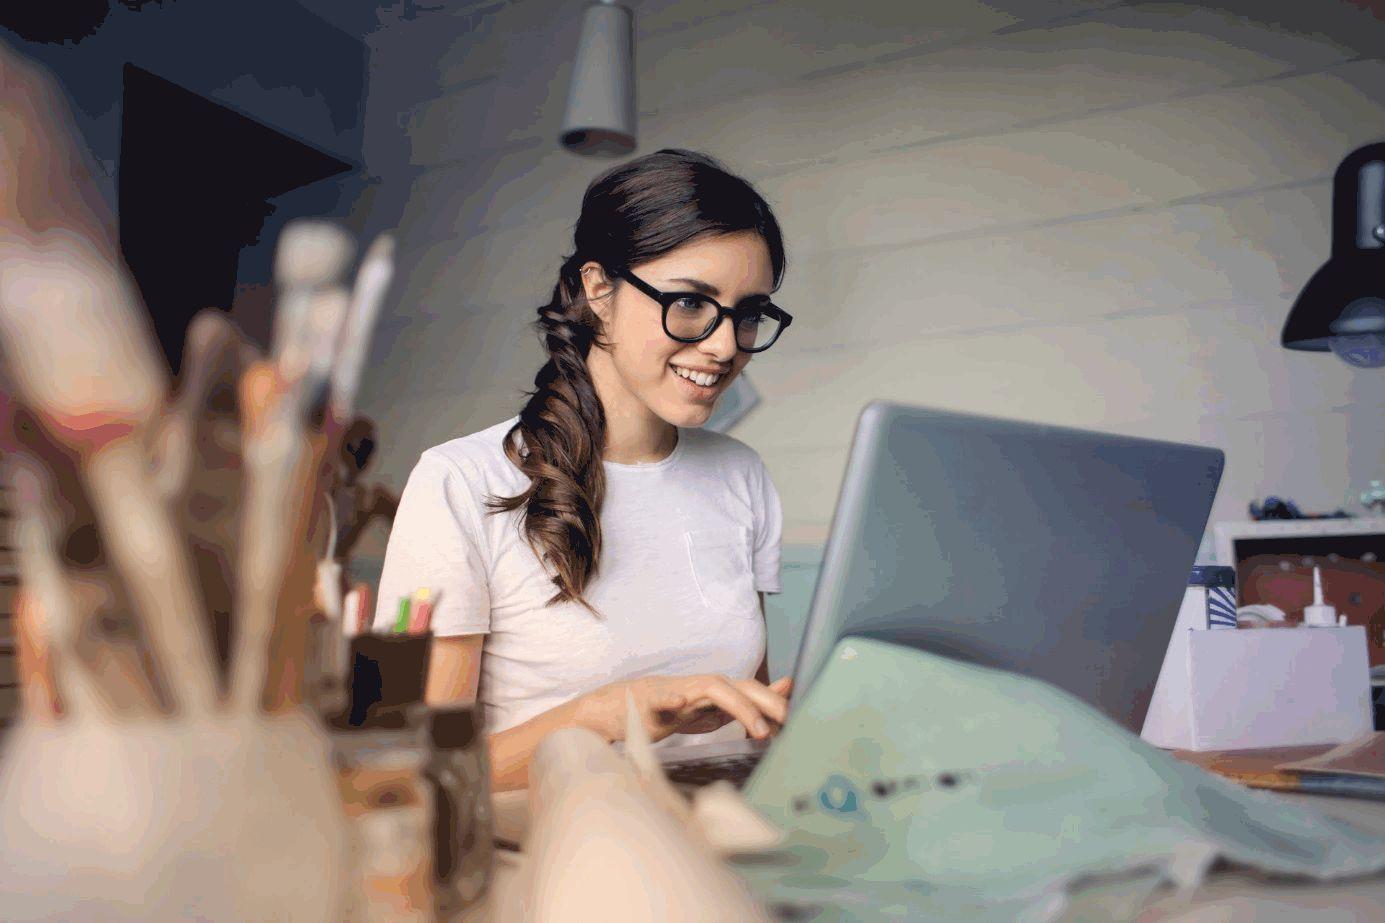 Junge Frau mit markanter Brille arbeitet an Laptop